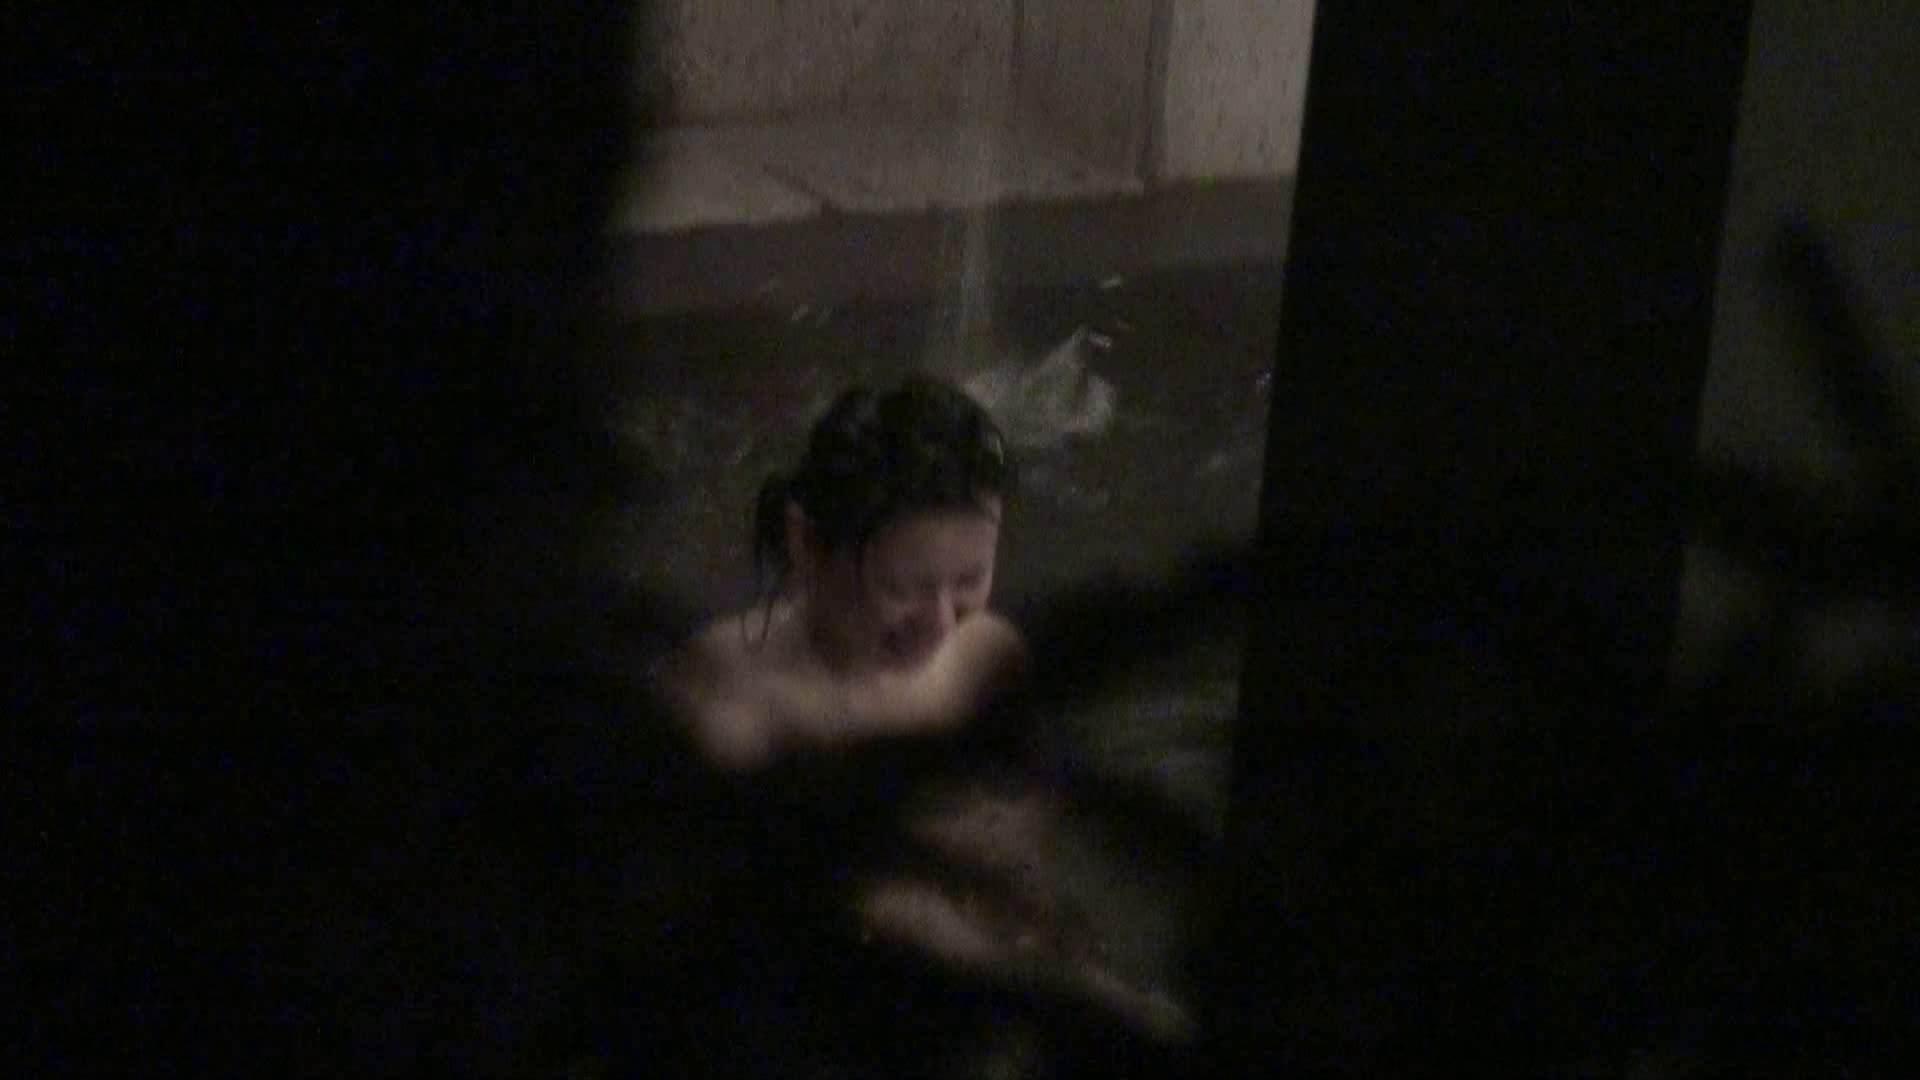 Aquaな露天風呂Vol.402 盗撮シリーズ | 露天風呂編  88PIX 85